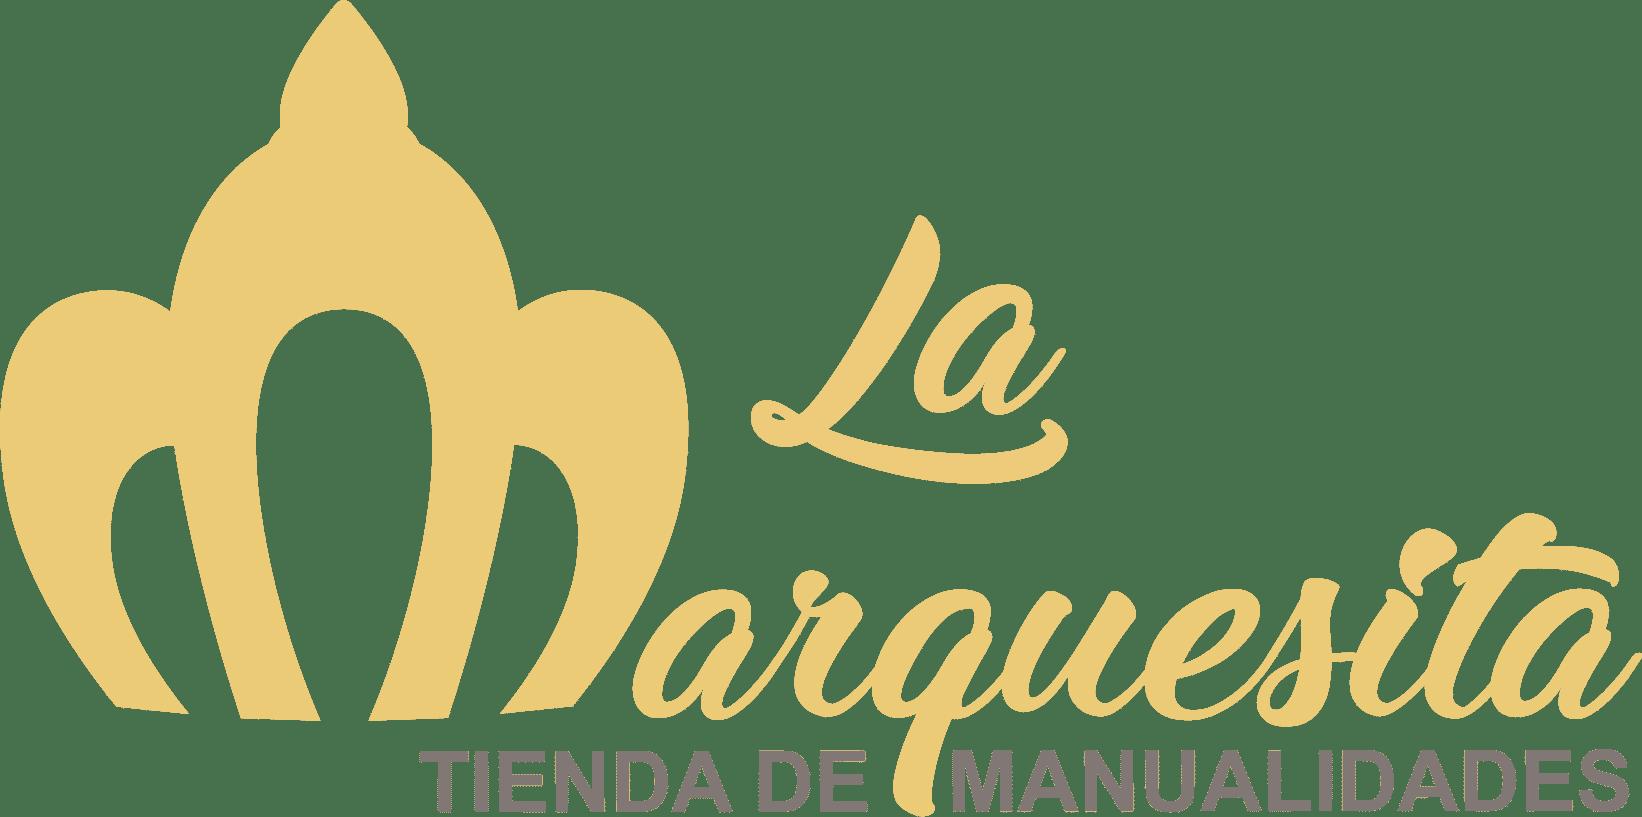 La Marquesita - Manualidades en madera